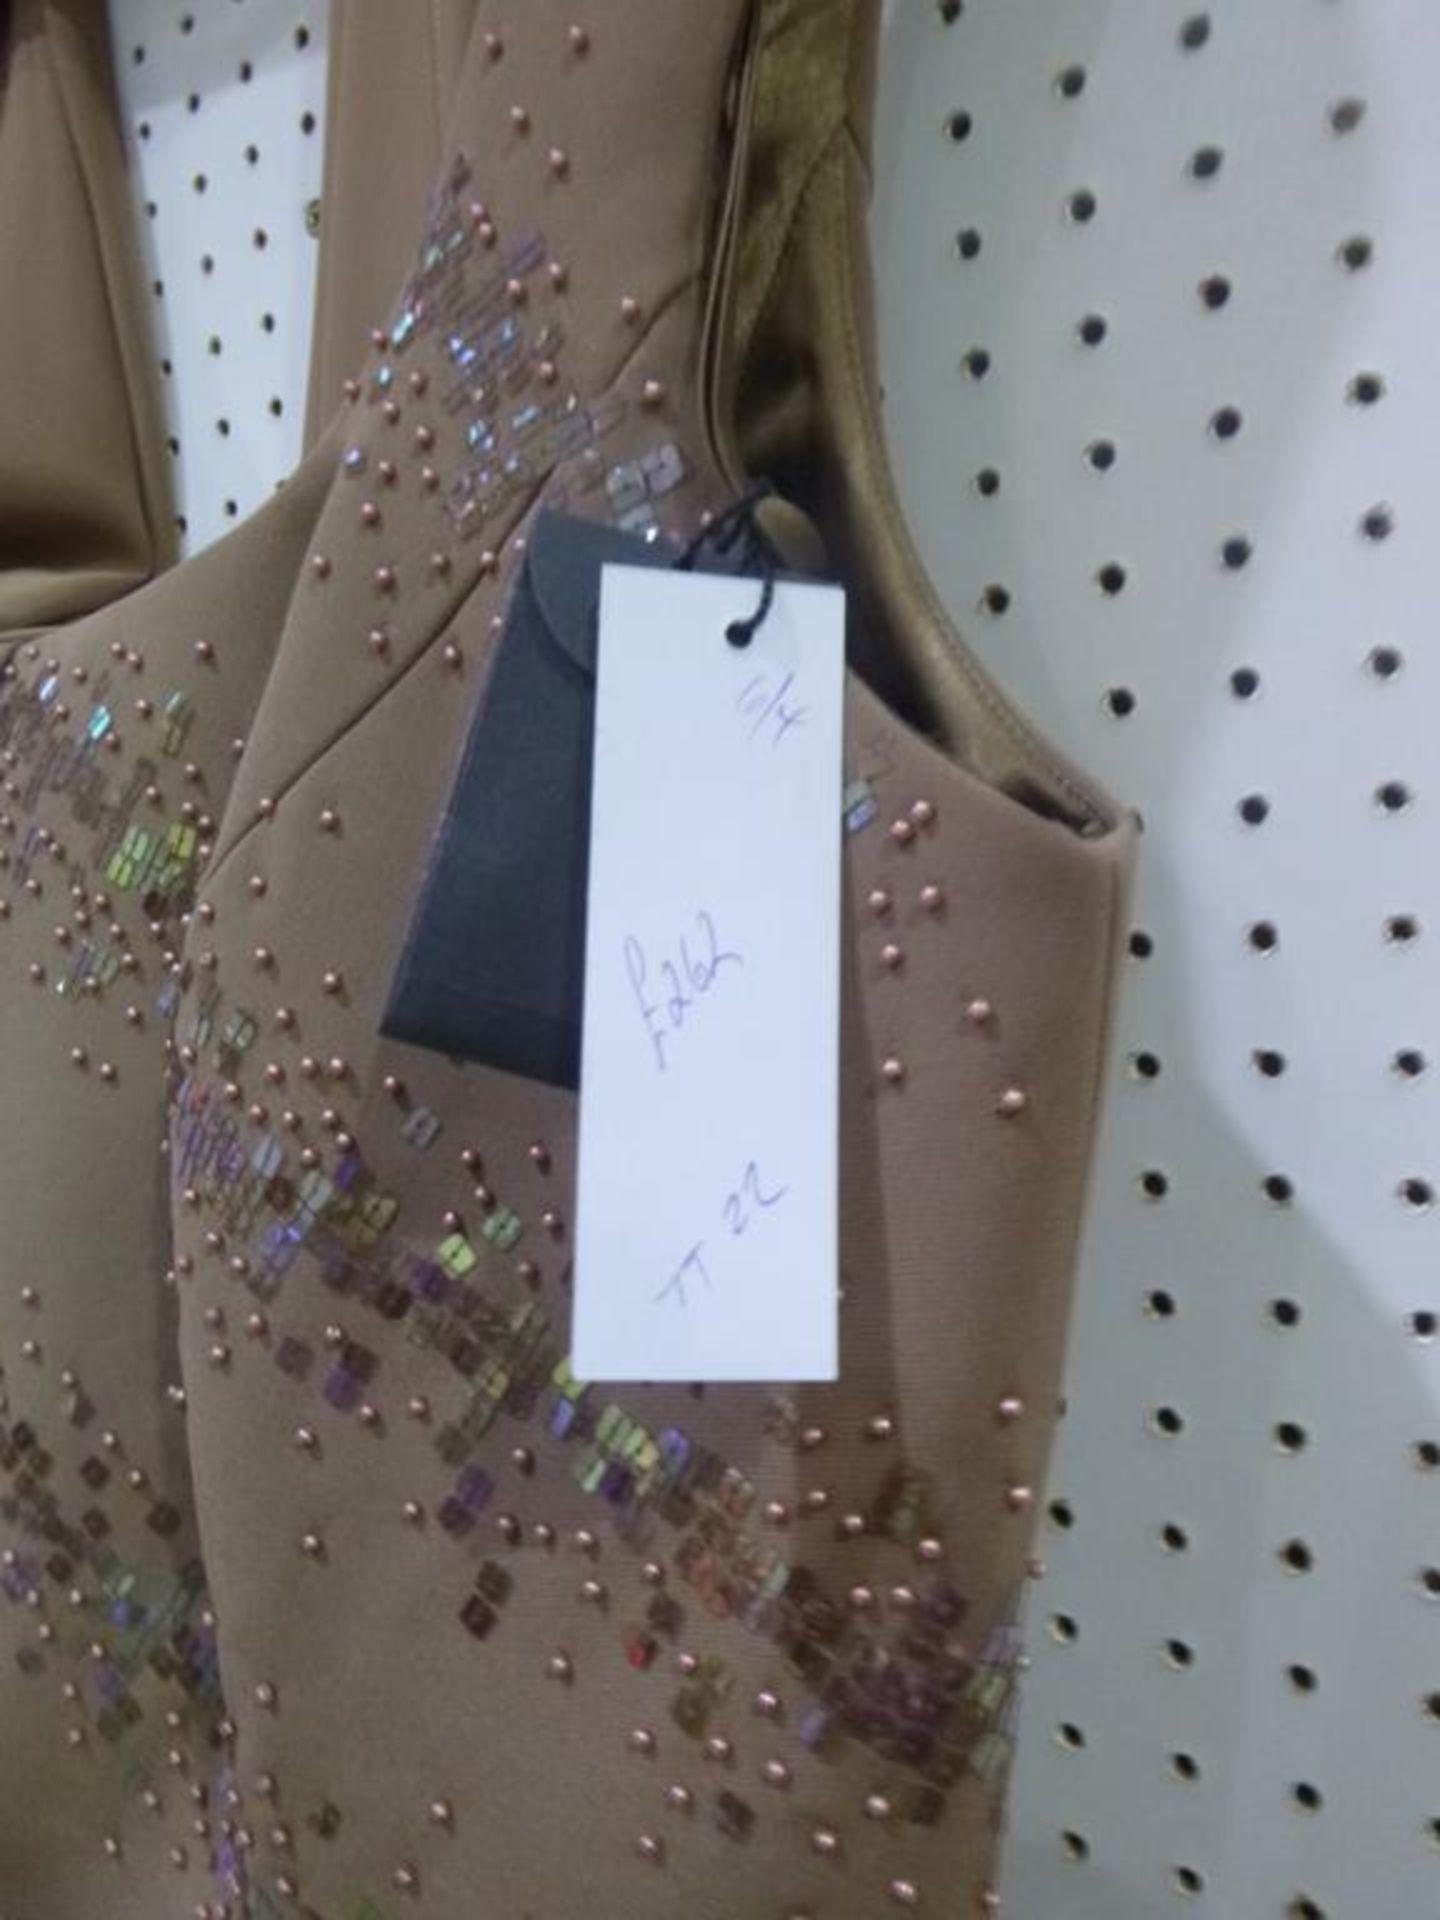 Lot 8019 - * Two Ladies Garments. A Simon Ellis (size 12) and a Veni Infantino (size 16). Please see